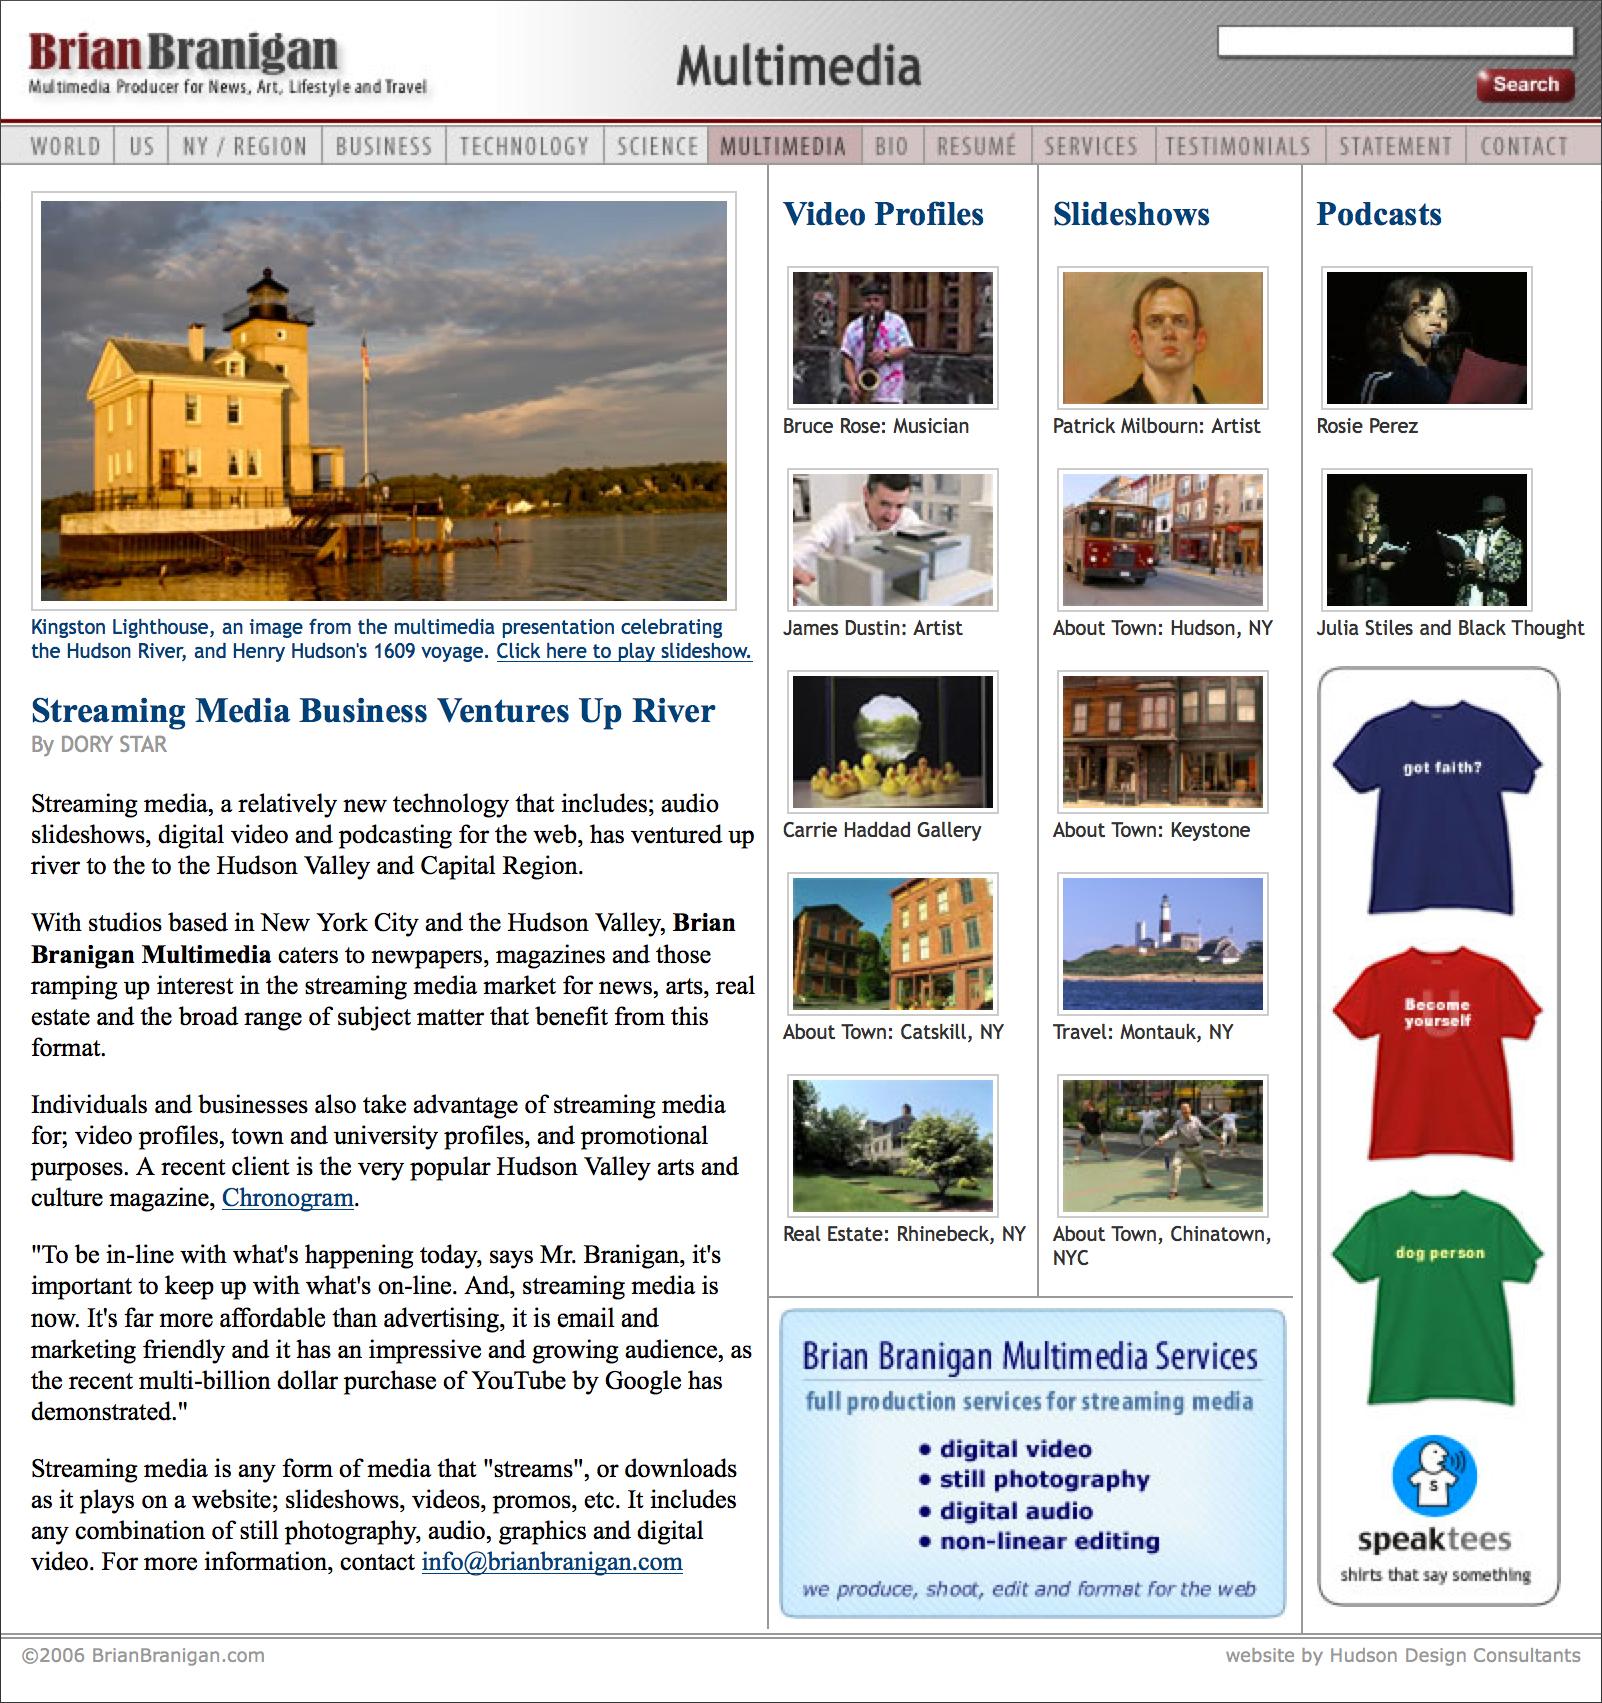 Brian Branigan Multimedia Promotional Email